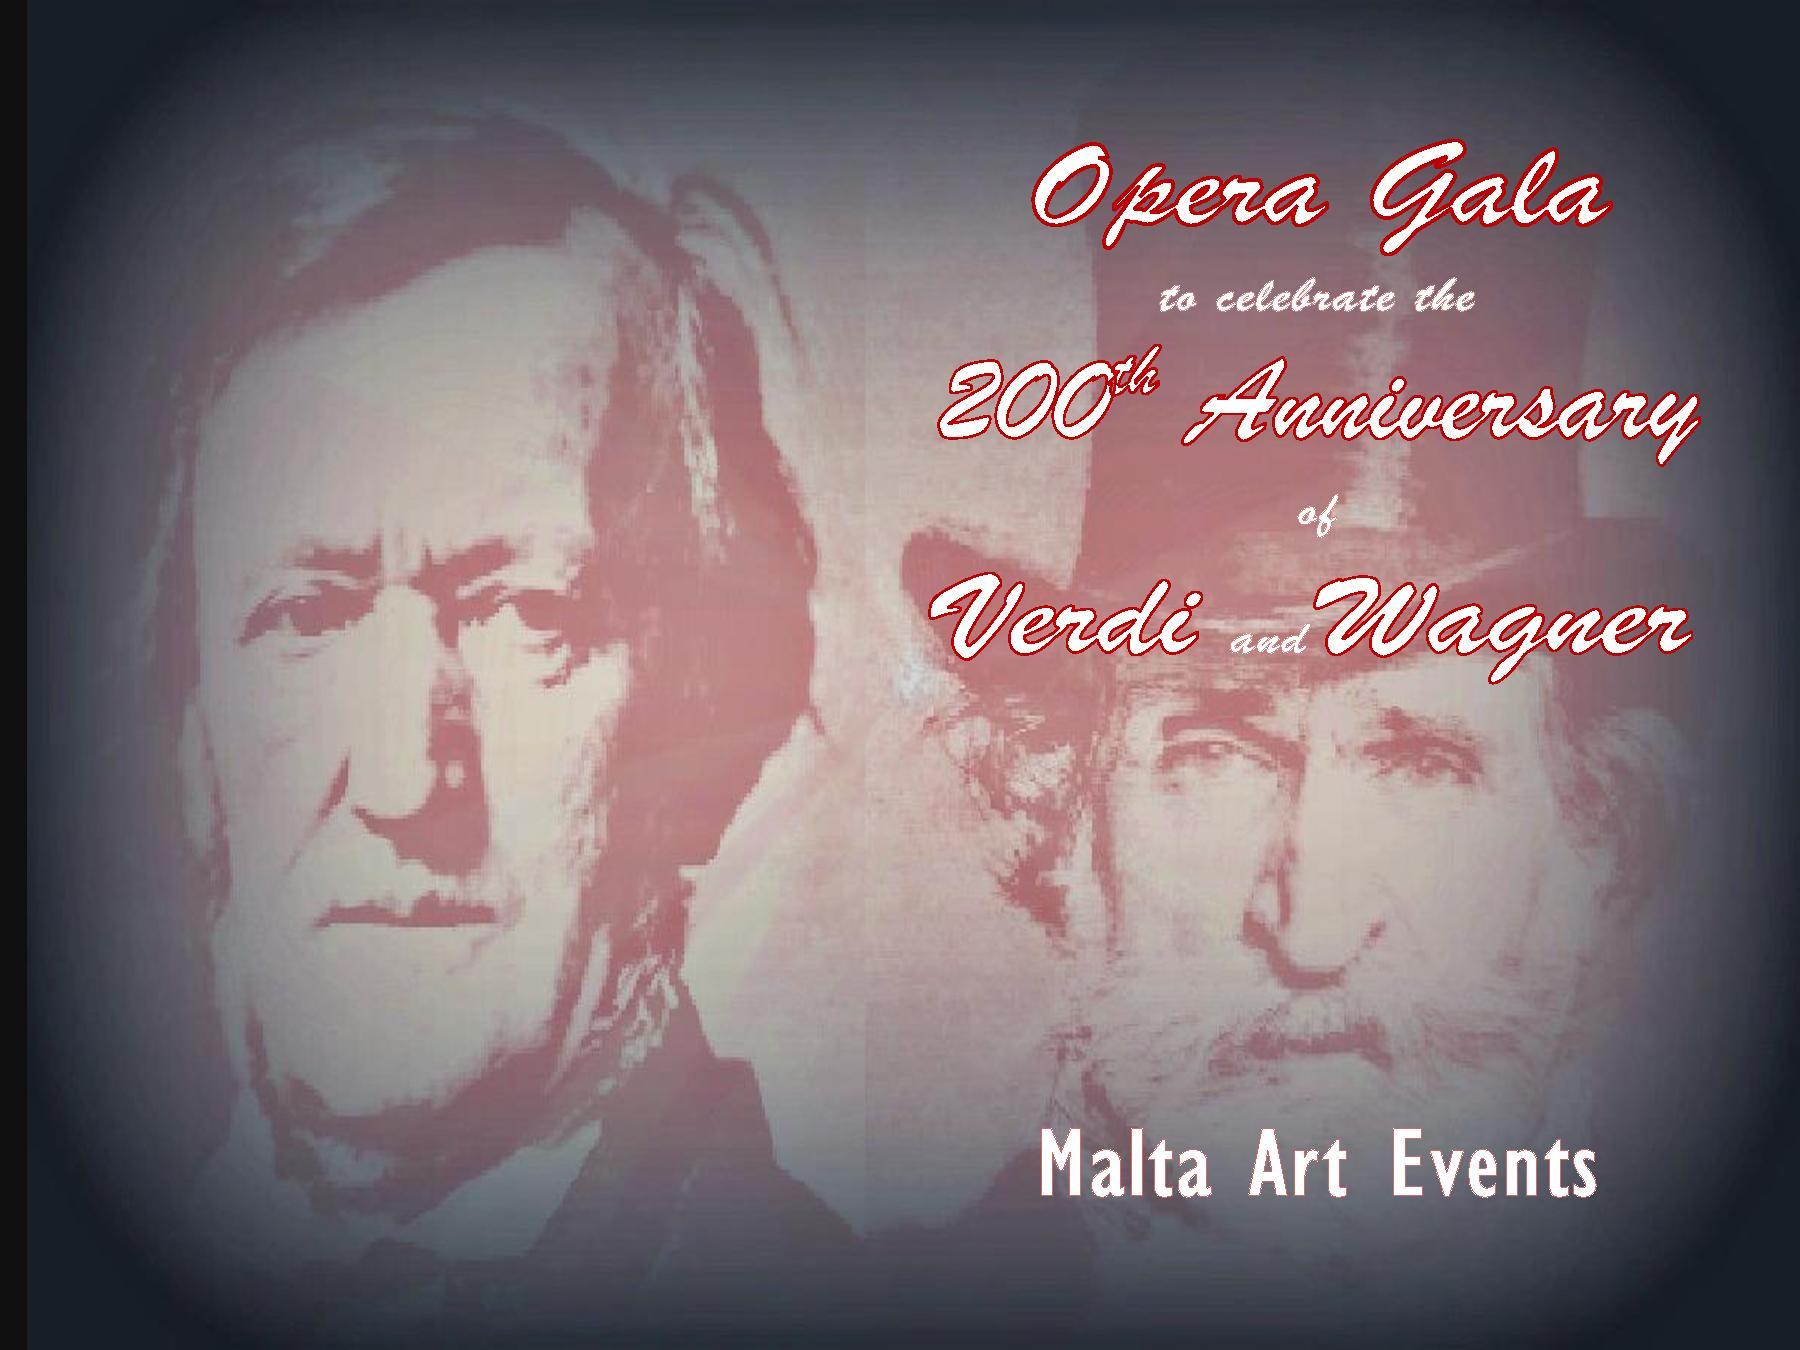 Verdi & Wagner Opera Gala Commemorative Programme